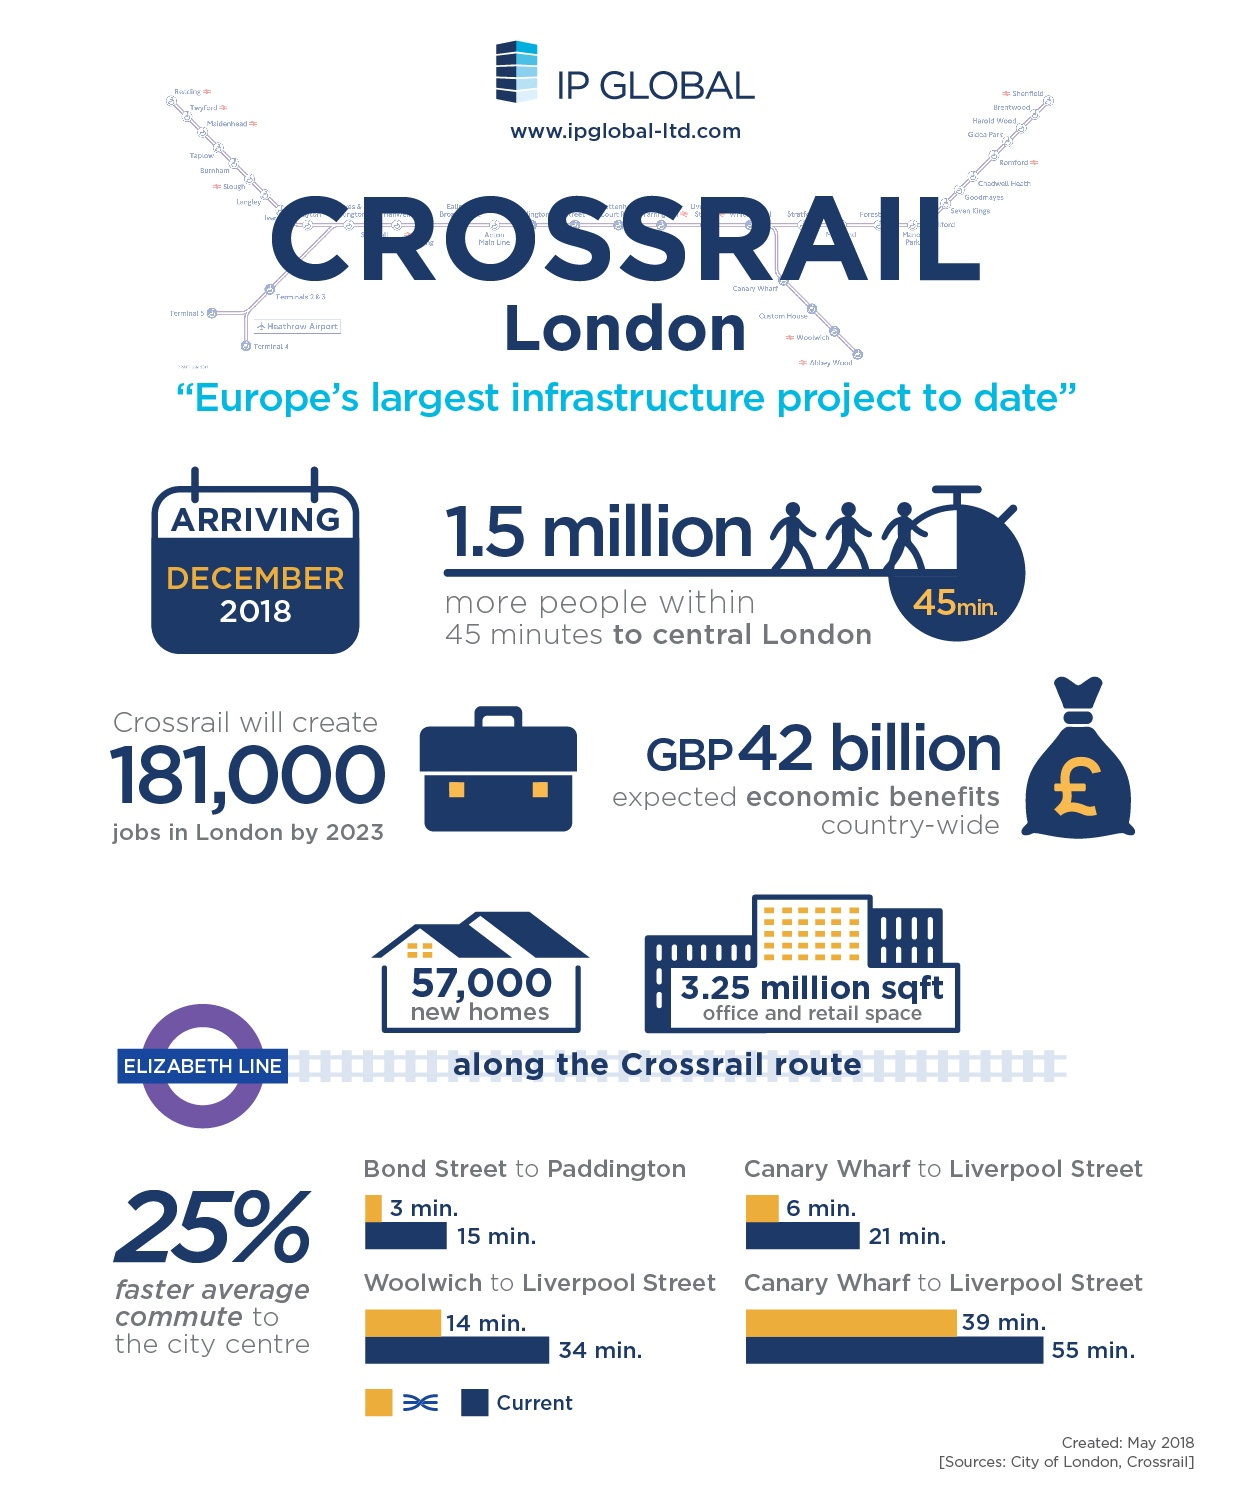 Crossrail_London_2018